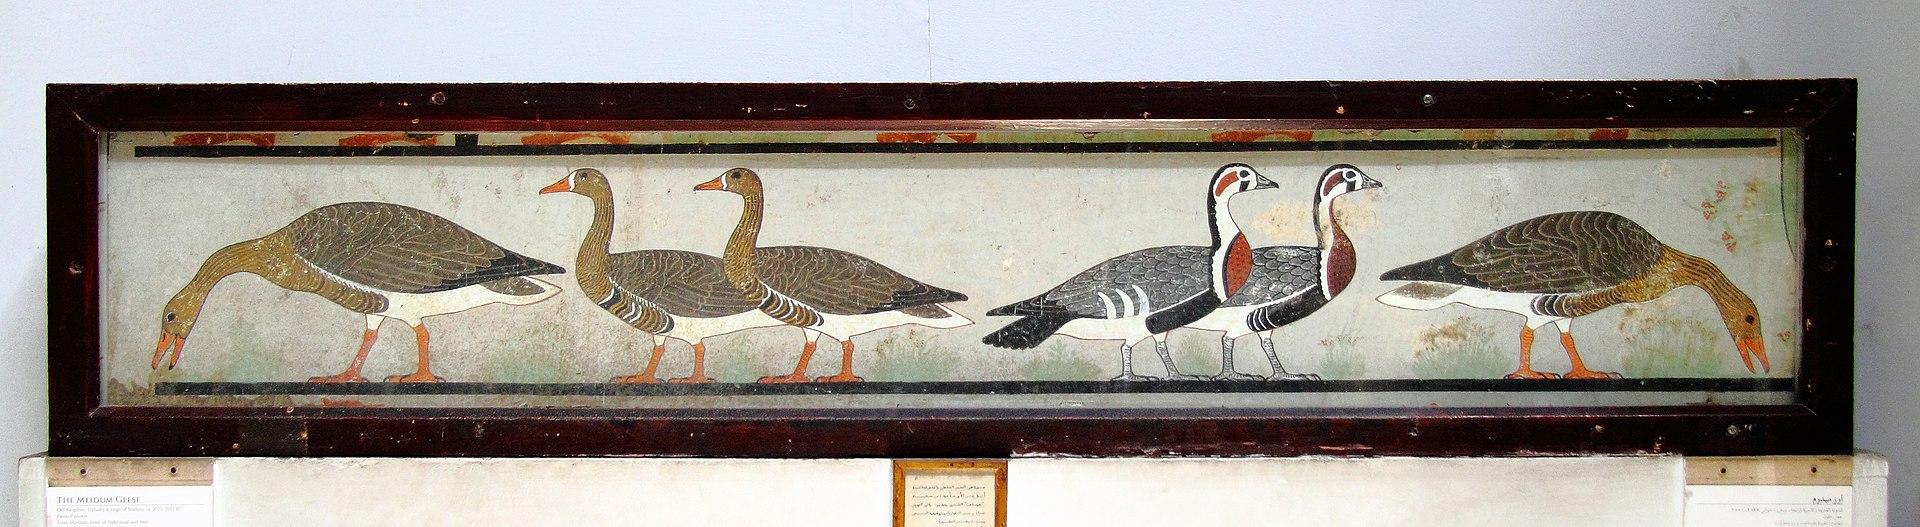 1920px-%C3%84gyptisches_Museum_Kairo_201